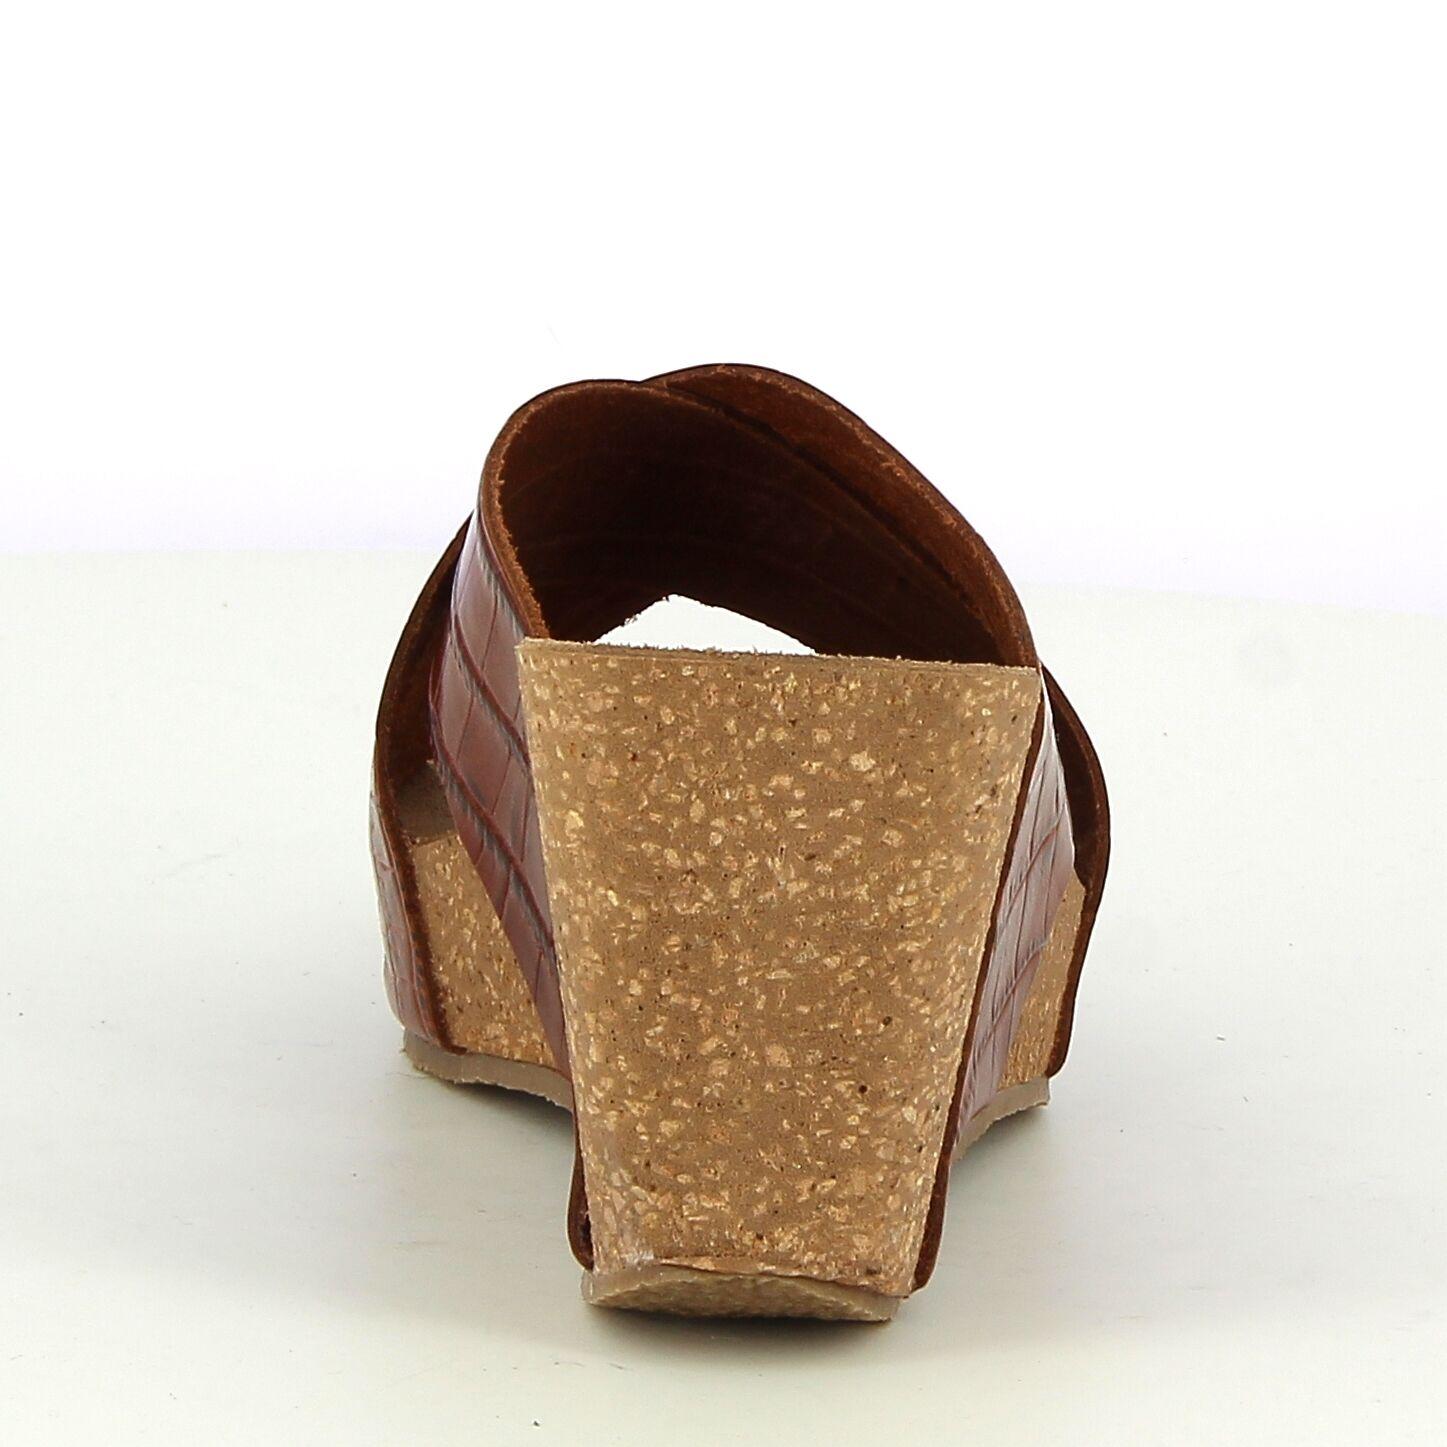 Ken Shoe Fashion - Chaussures Slip On - Camel